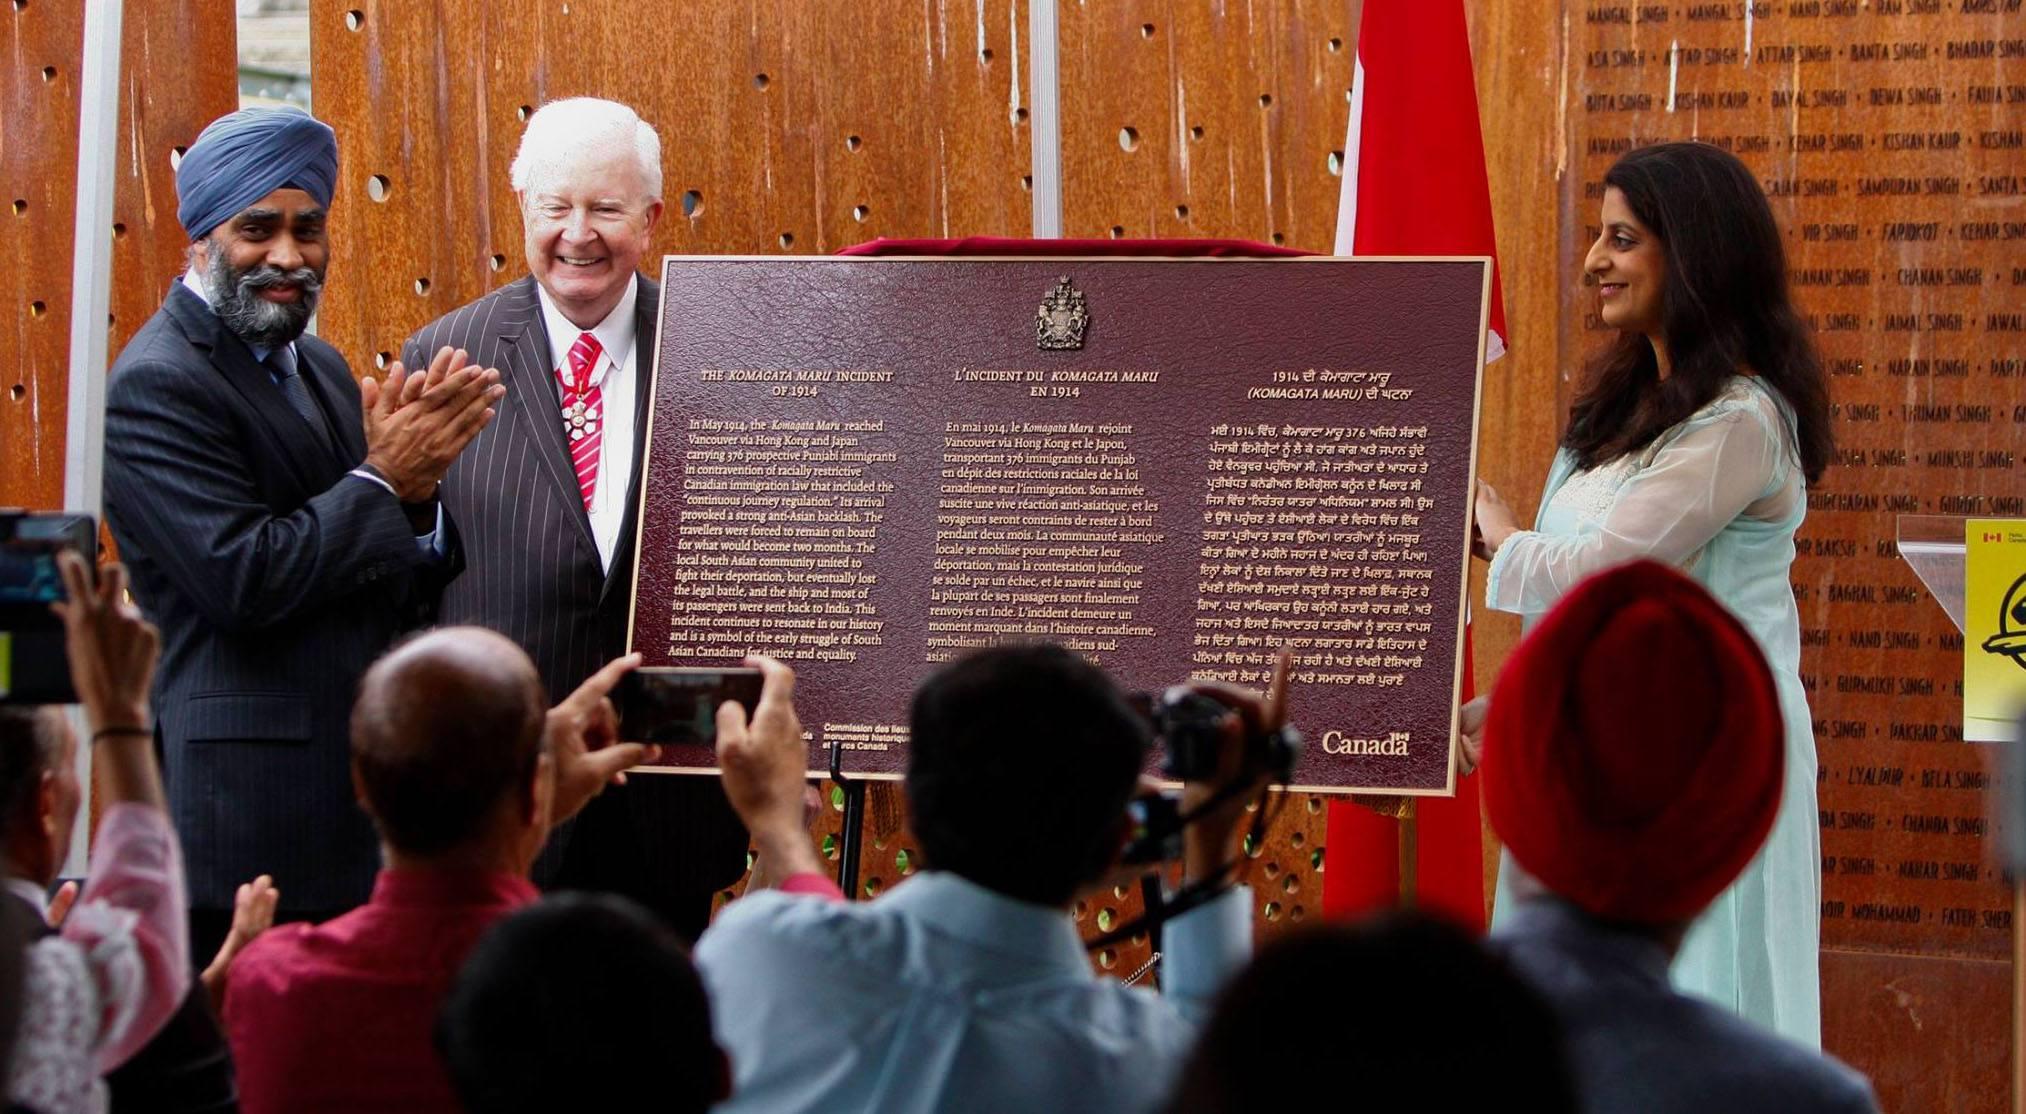 The new komagata maru plaque unveiled by defence minister harjit sajjan in vancouver harjit sajjanfacebook